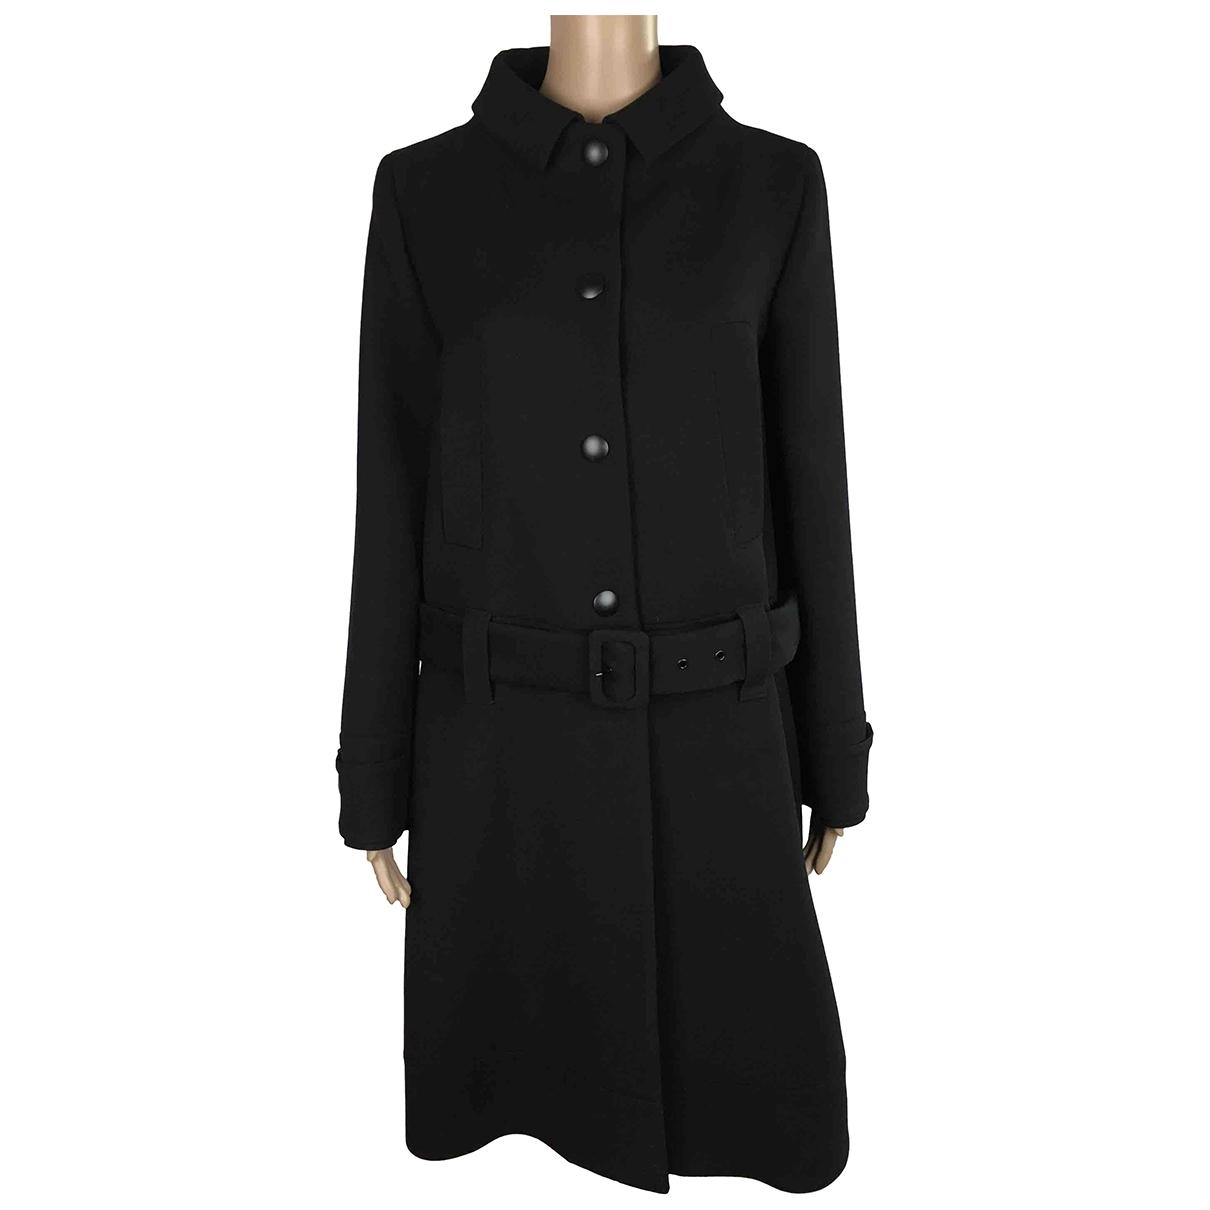 Prada \N Black Wool coat for Women 40 IT